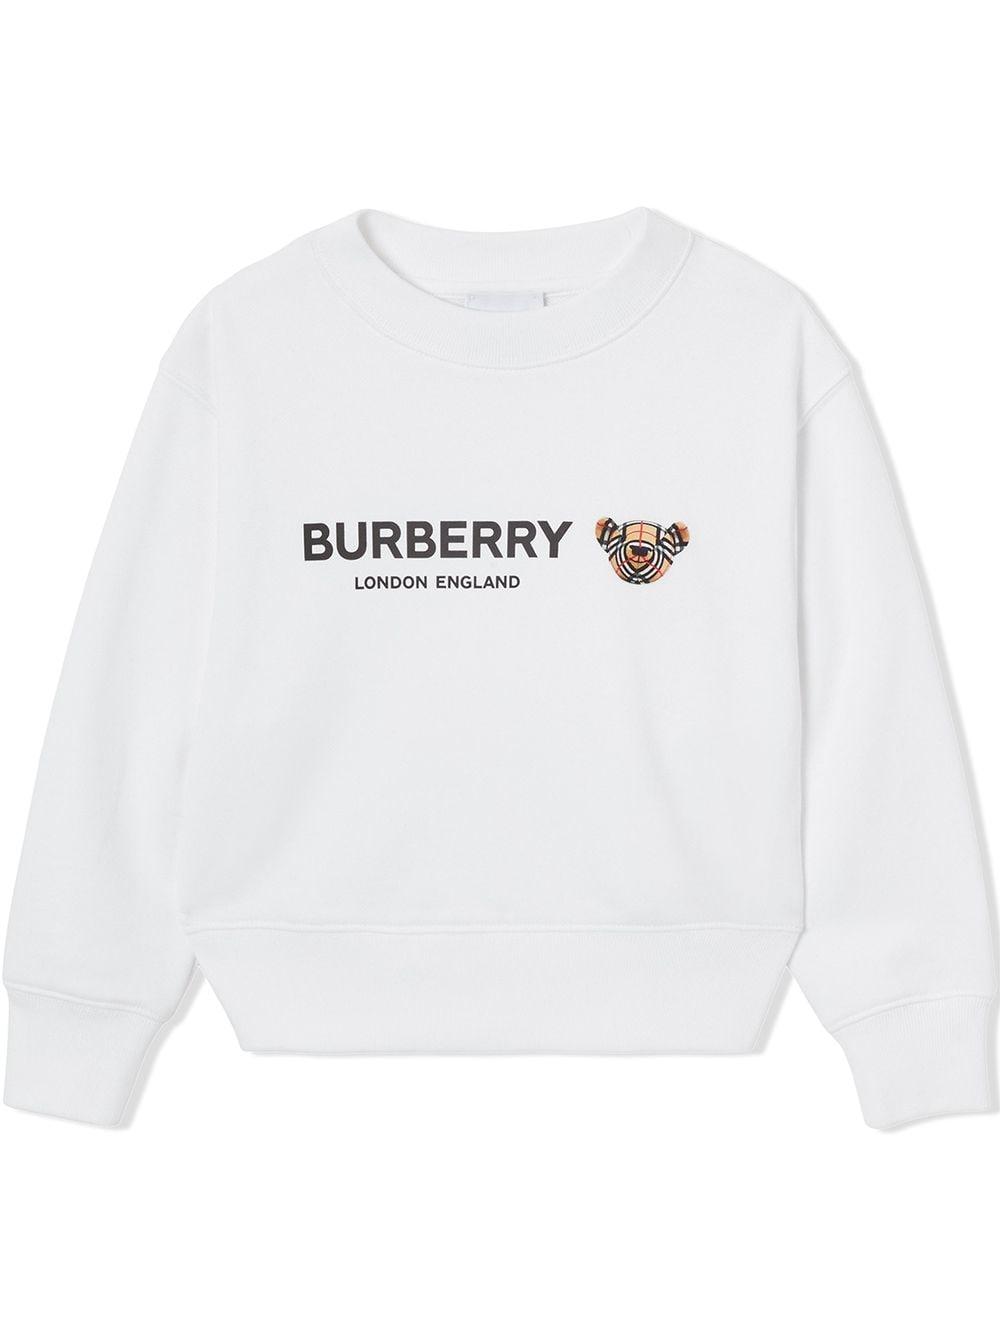 SWEATSHIRT BURBERRY KIDS |  | 8042941A1464